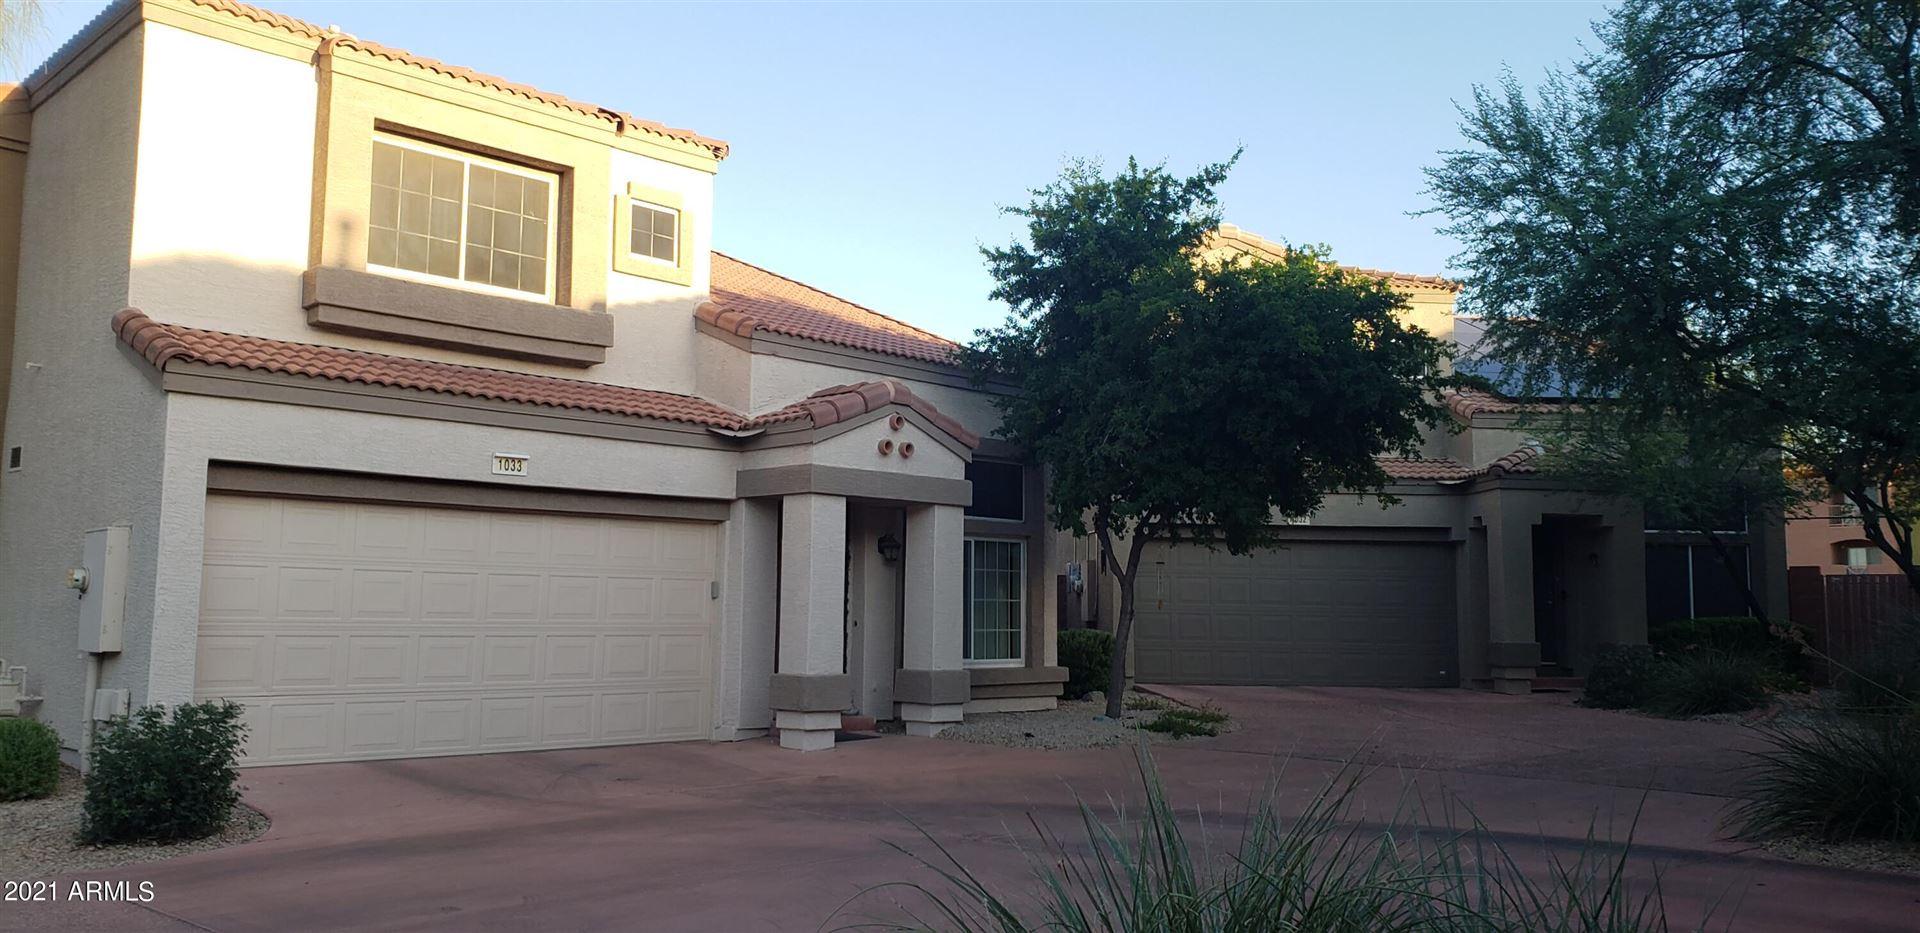 17606 N 17TH Place #1033, Phoenix, AZ 85022 - MLS#: 6297993